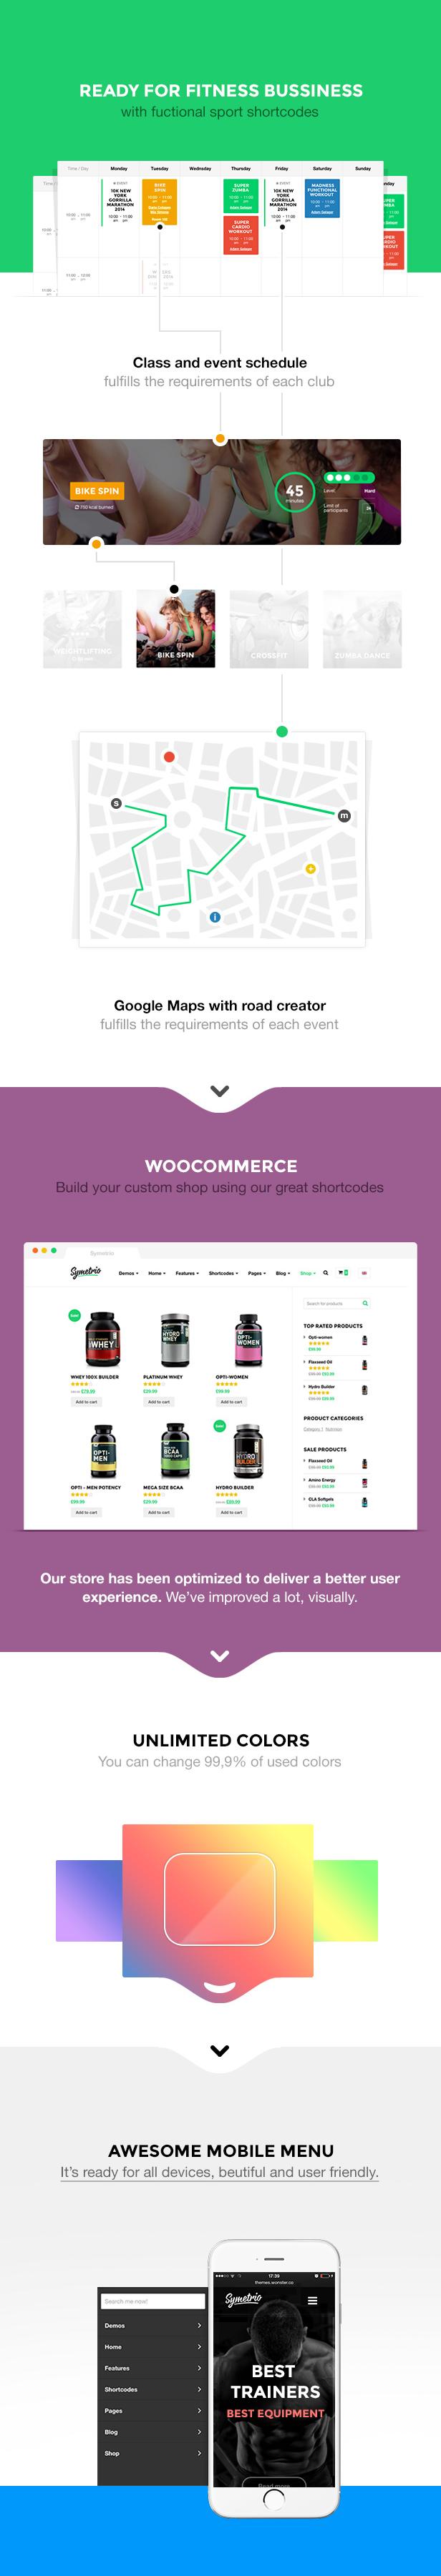 WIUgue - Symetrio - Gym & Fitness WordPress Theme